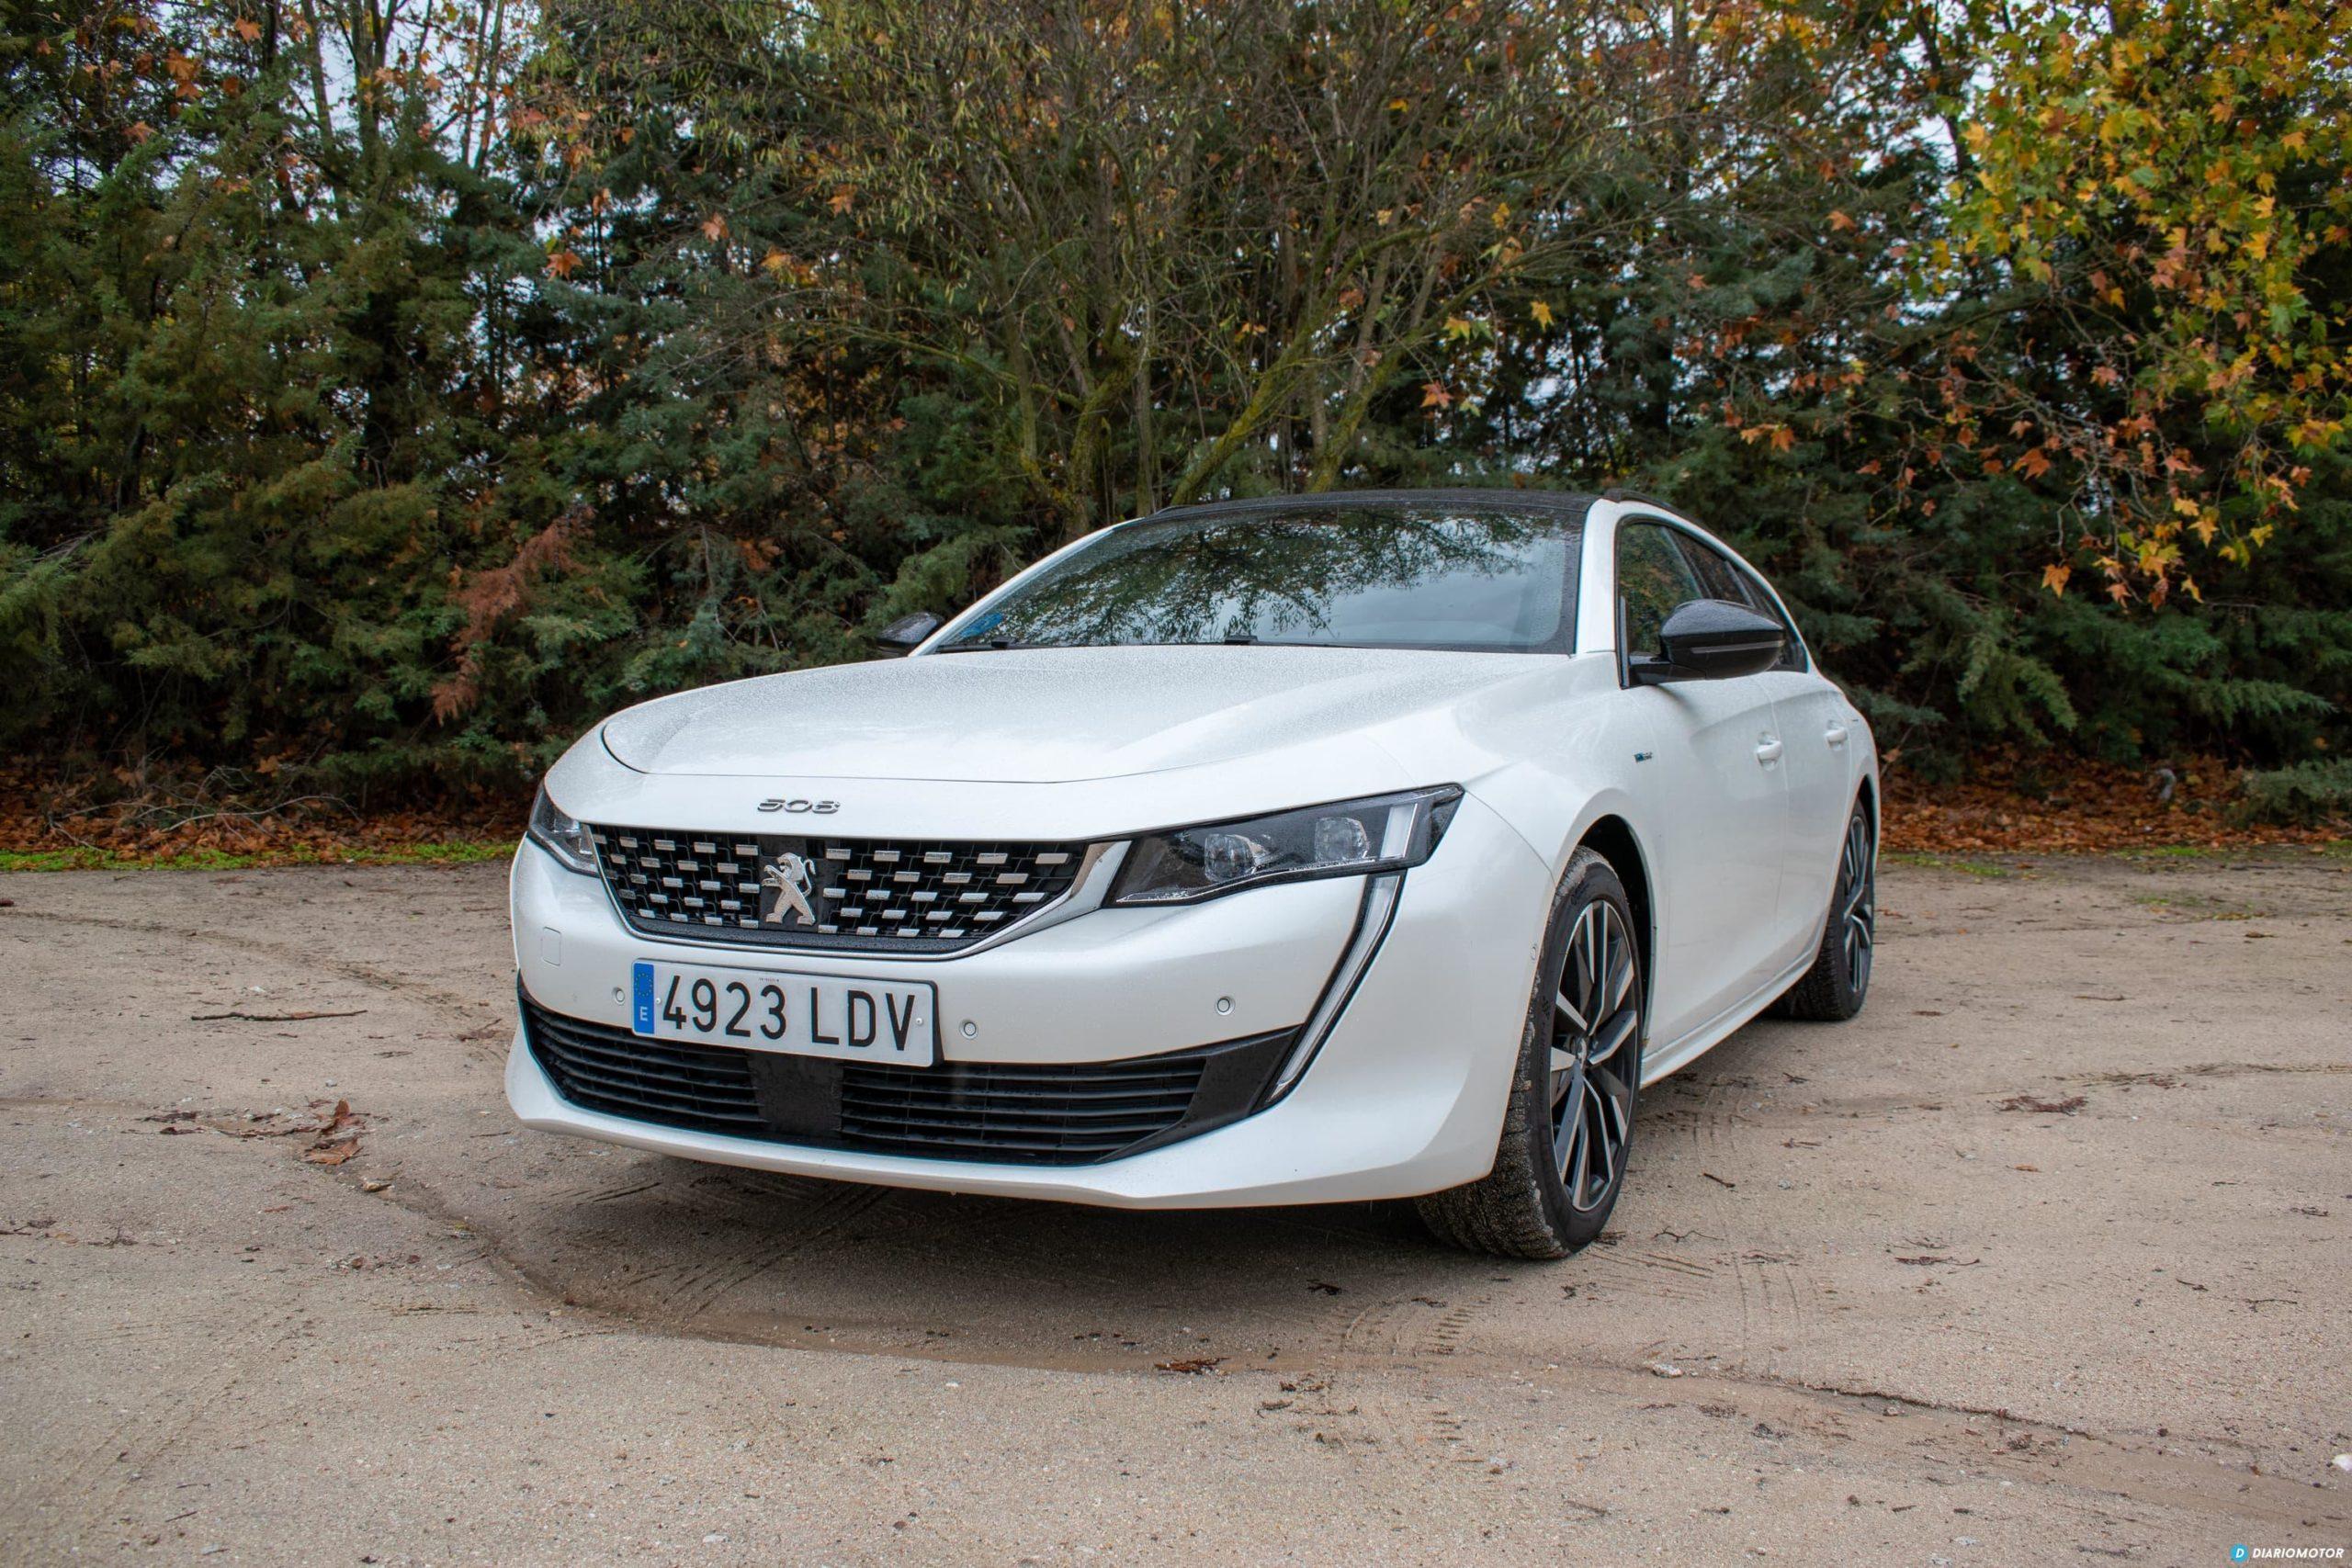 Prueba Contacto Peugeot 508sw Hybrid 1